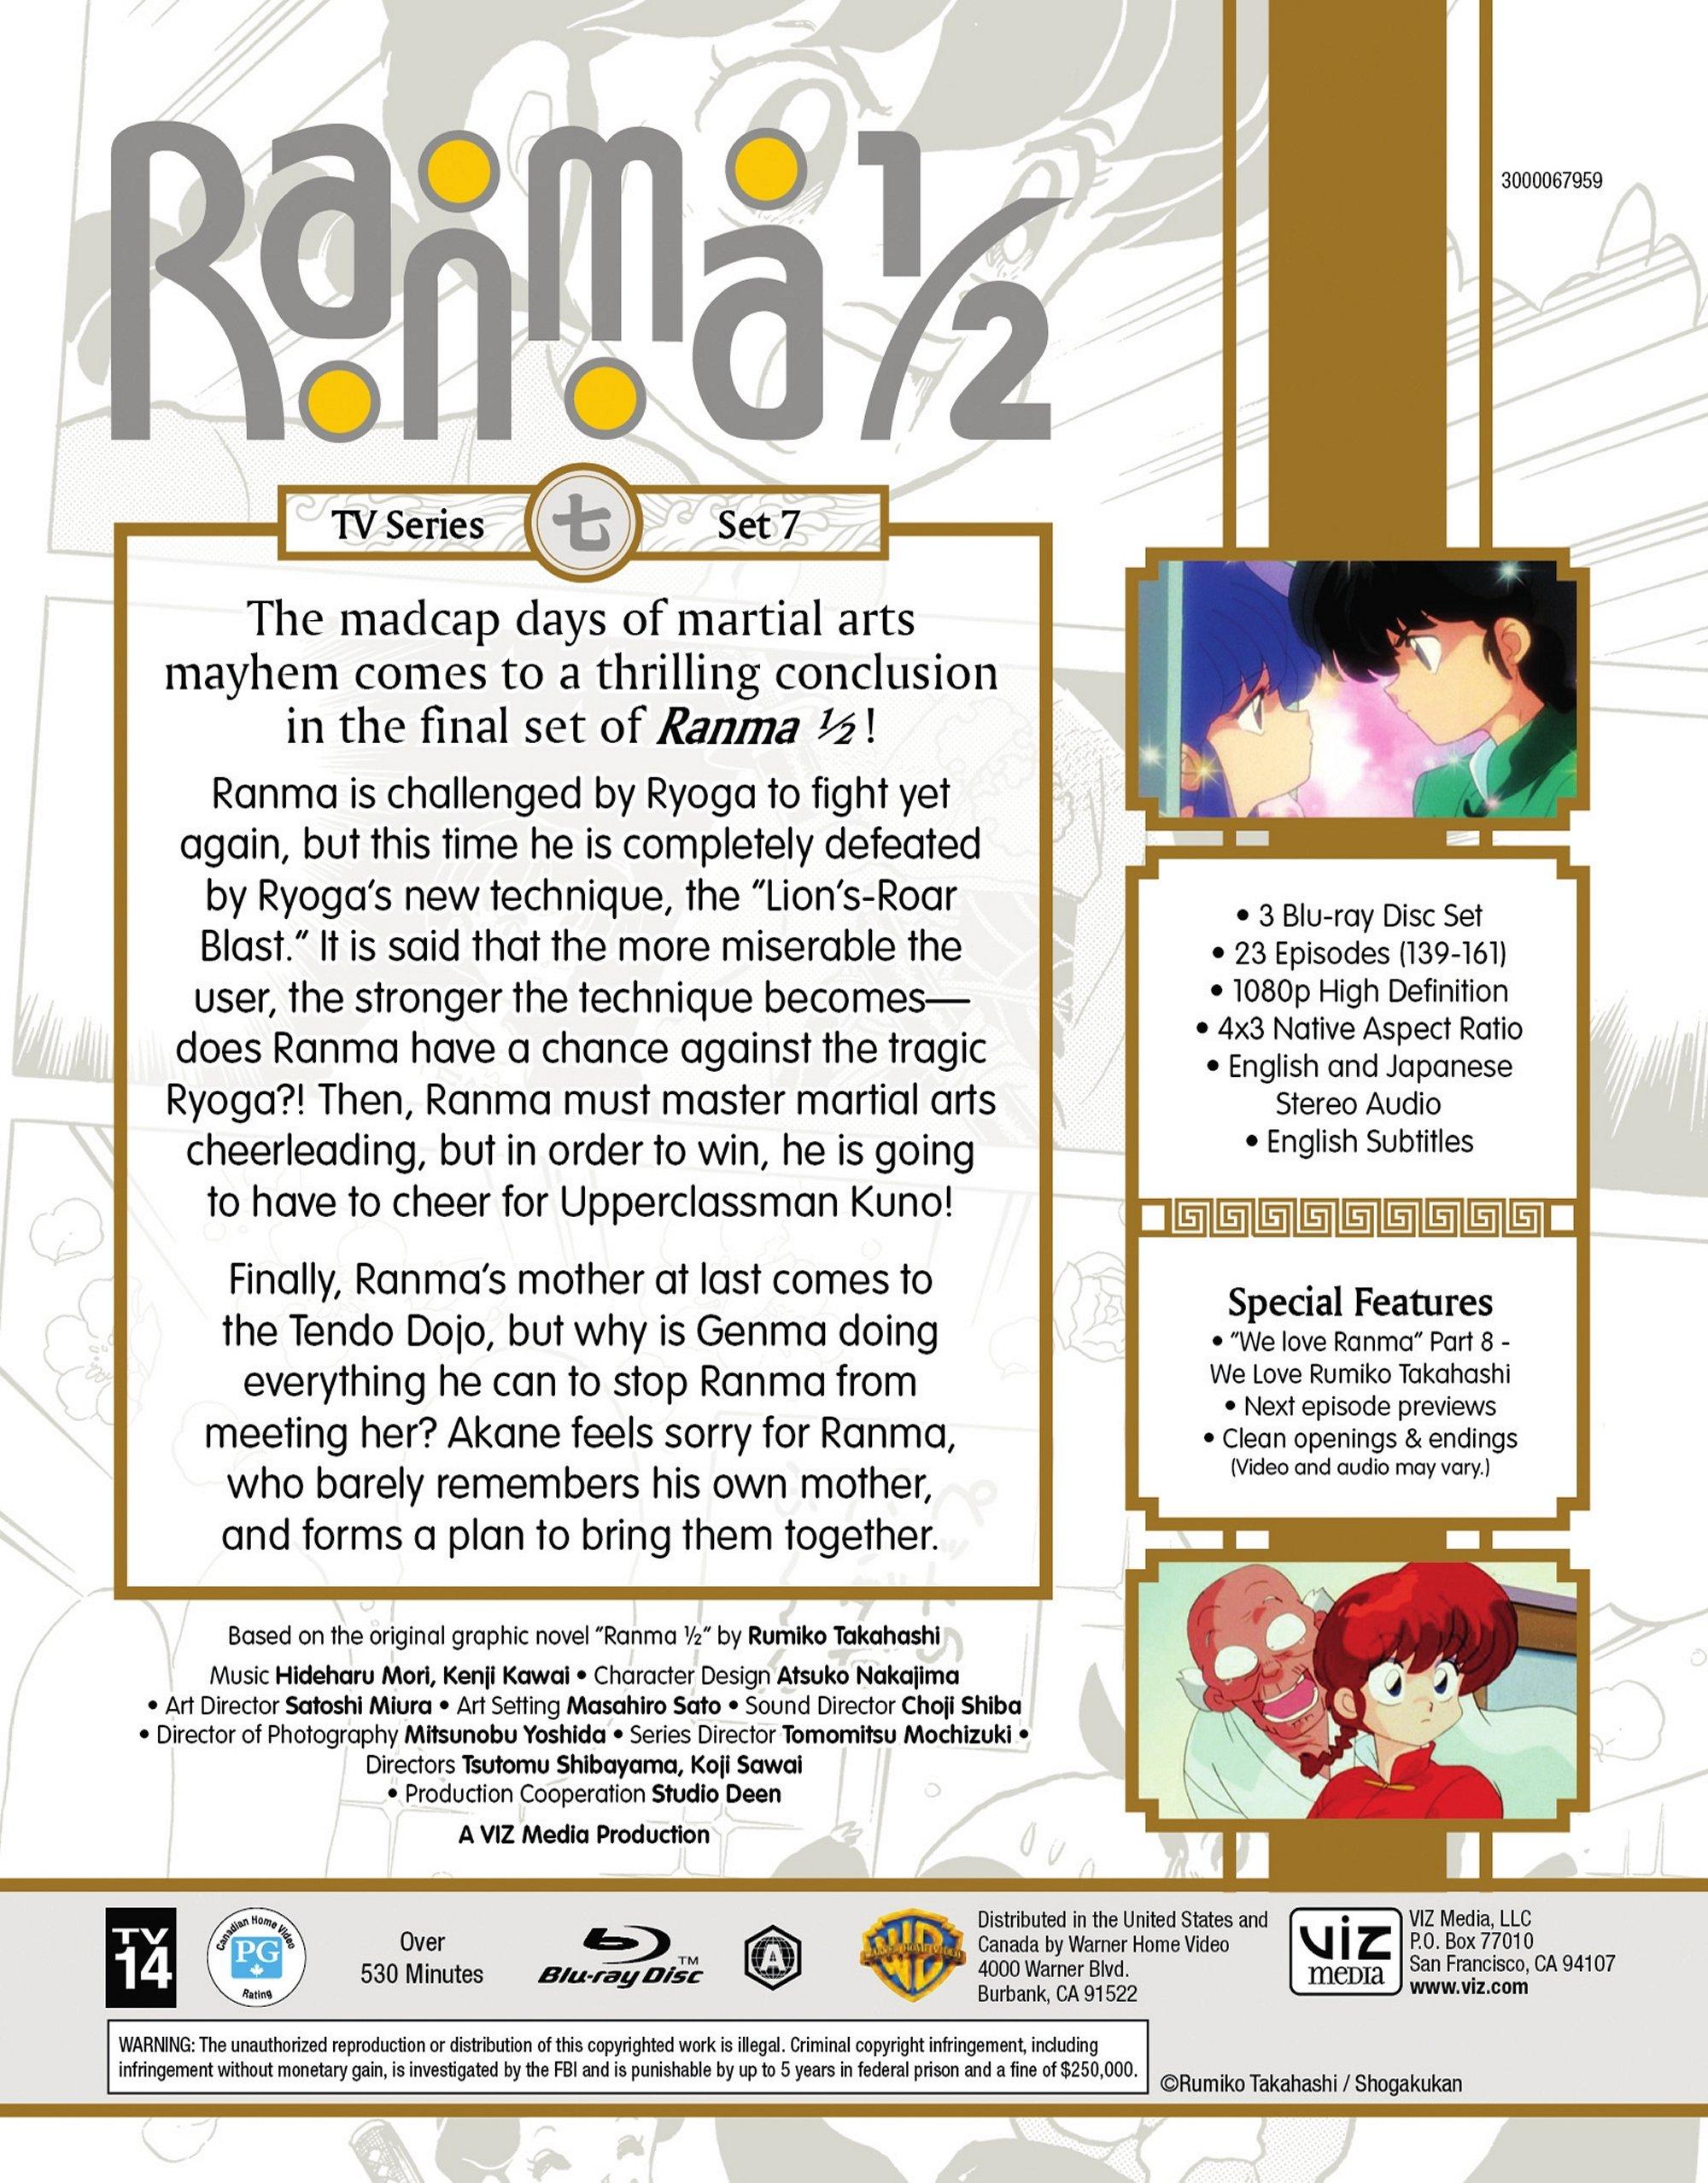 Ranma 1/2 Standard Edition Blu-ray Set 7